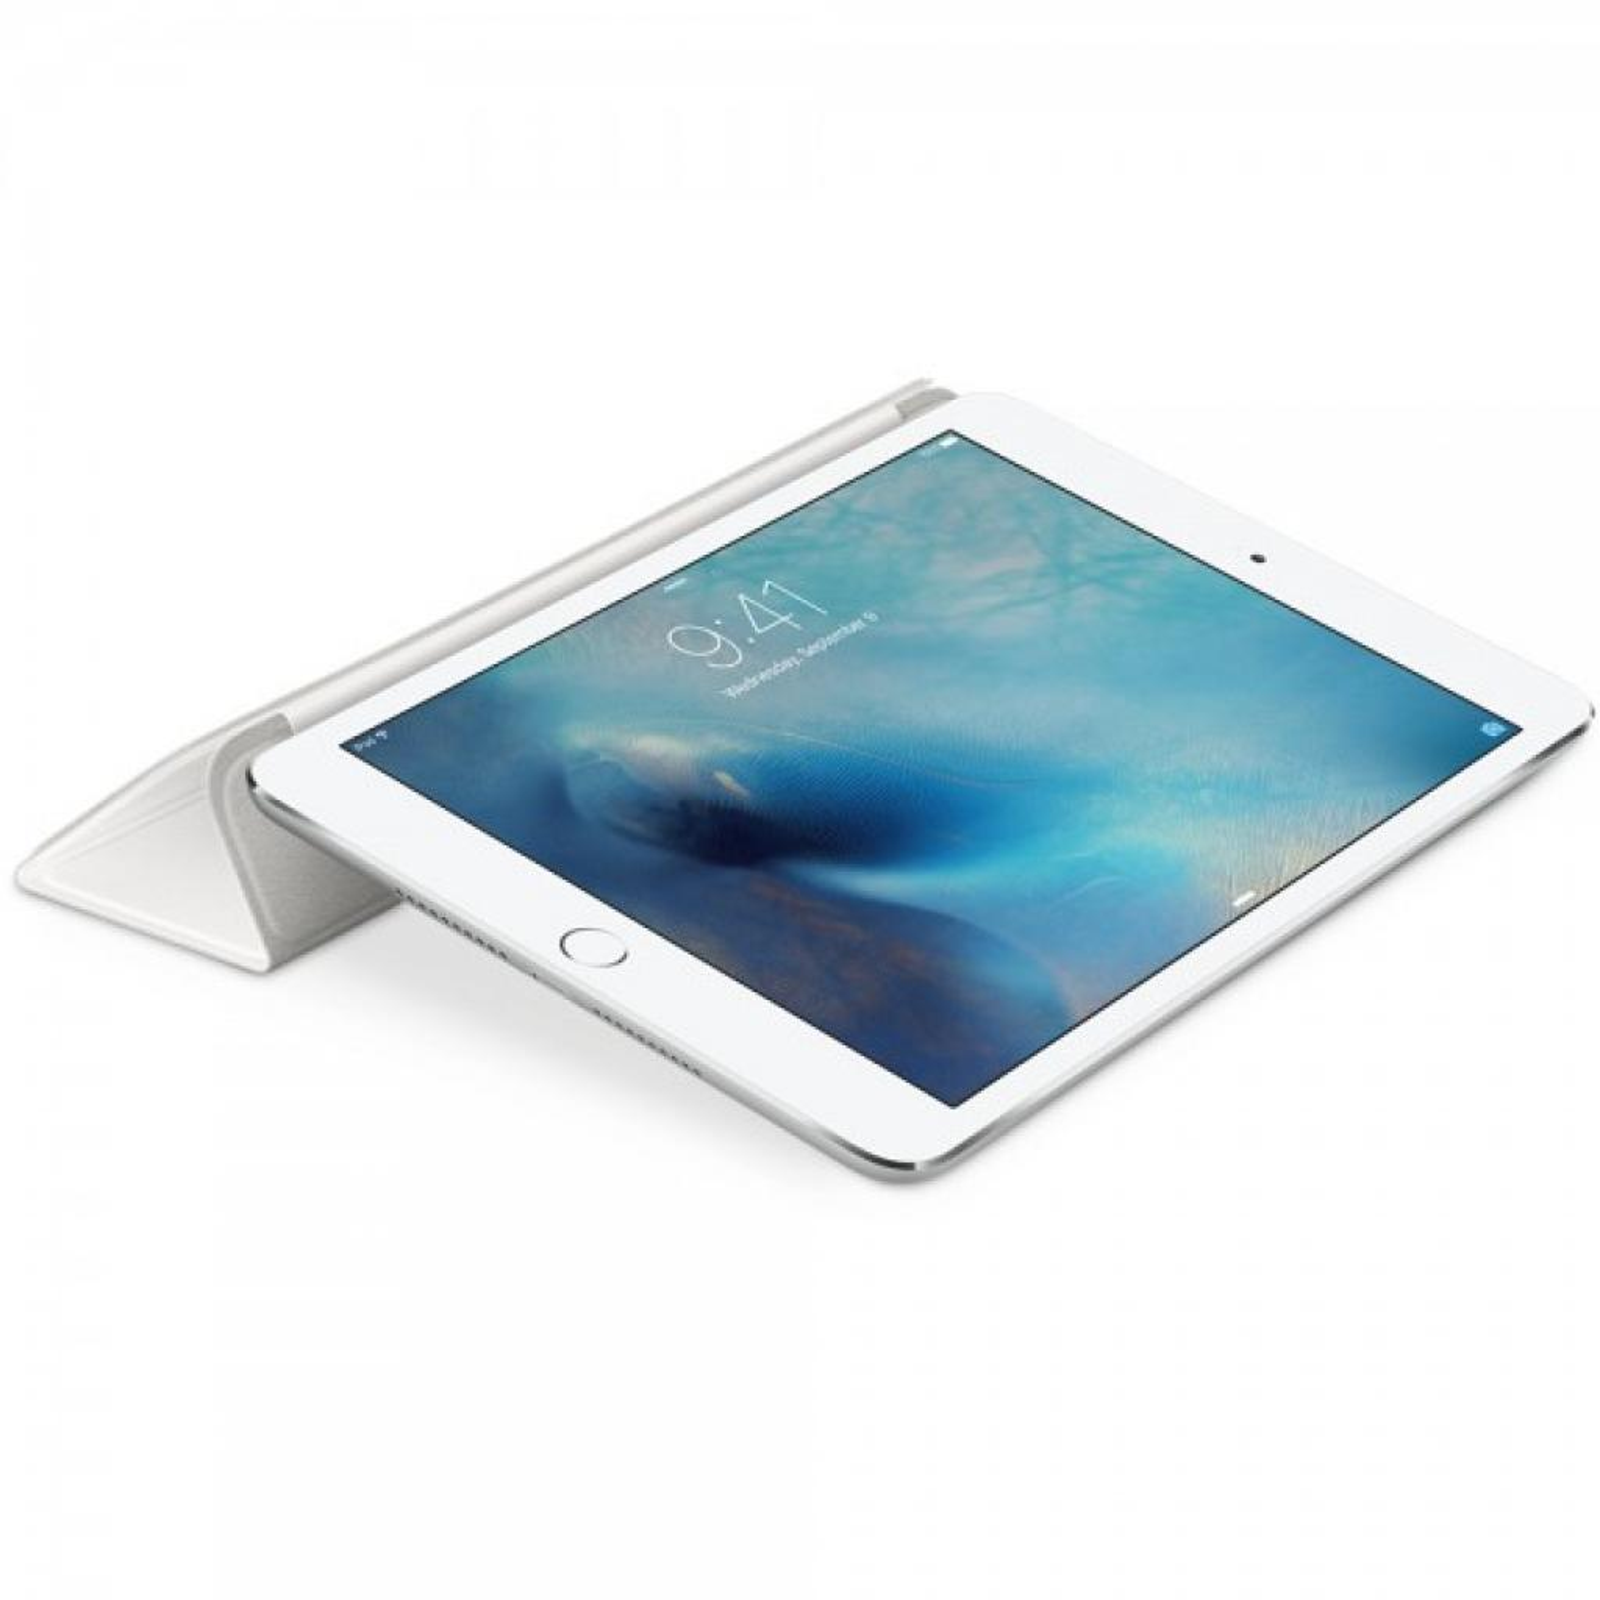 Чехол для планшета Apple Smart Cover для iPad mini 4 White (MKLW2ZM/A) изображение 4